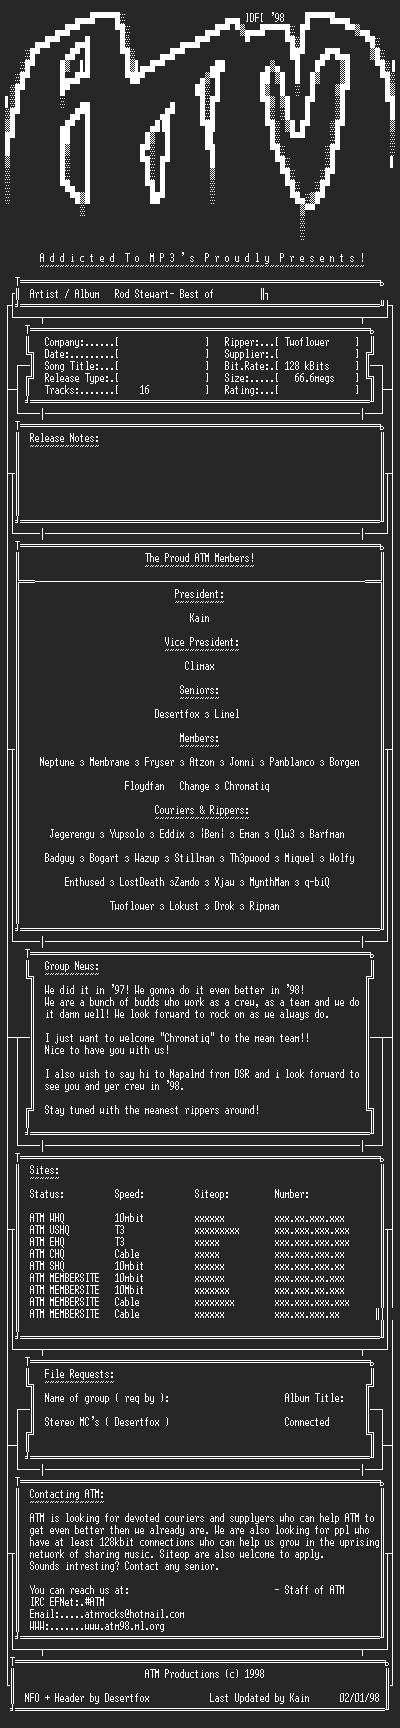 NFO file for Rod_Stewart_-_Best_of_-_ATM